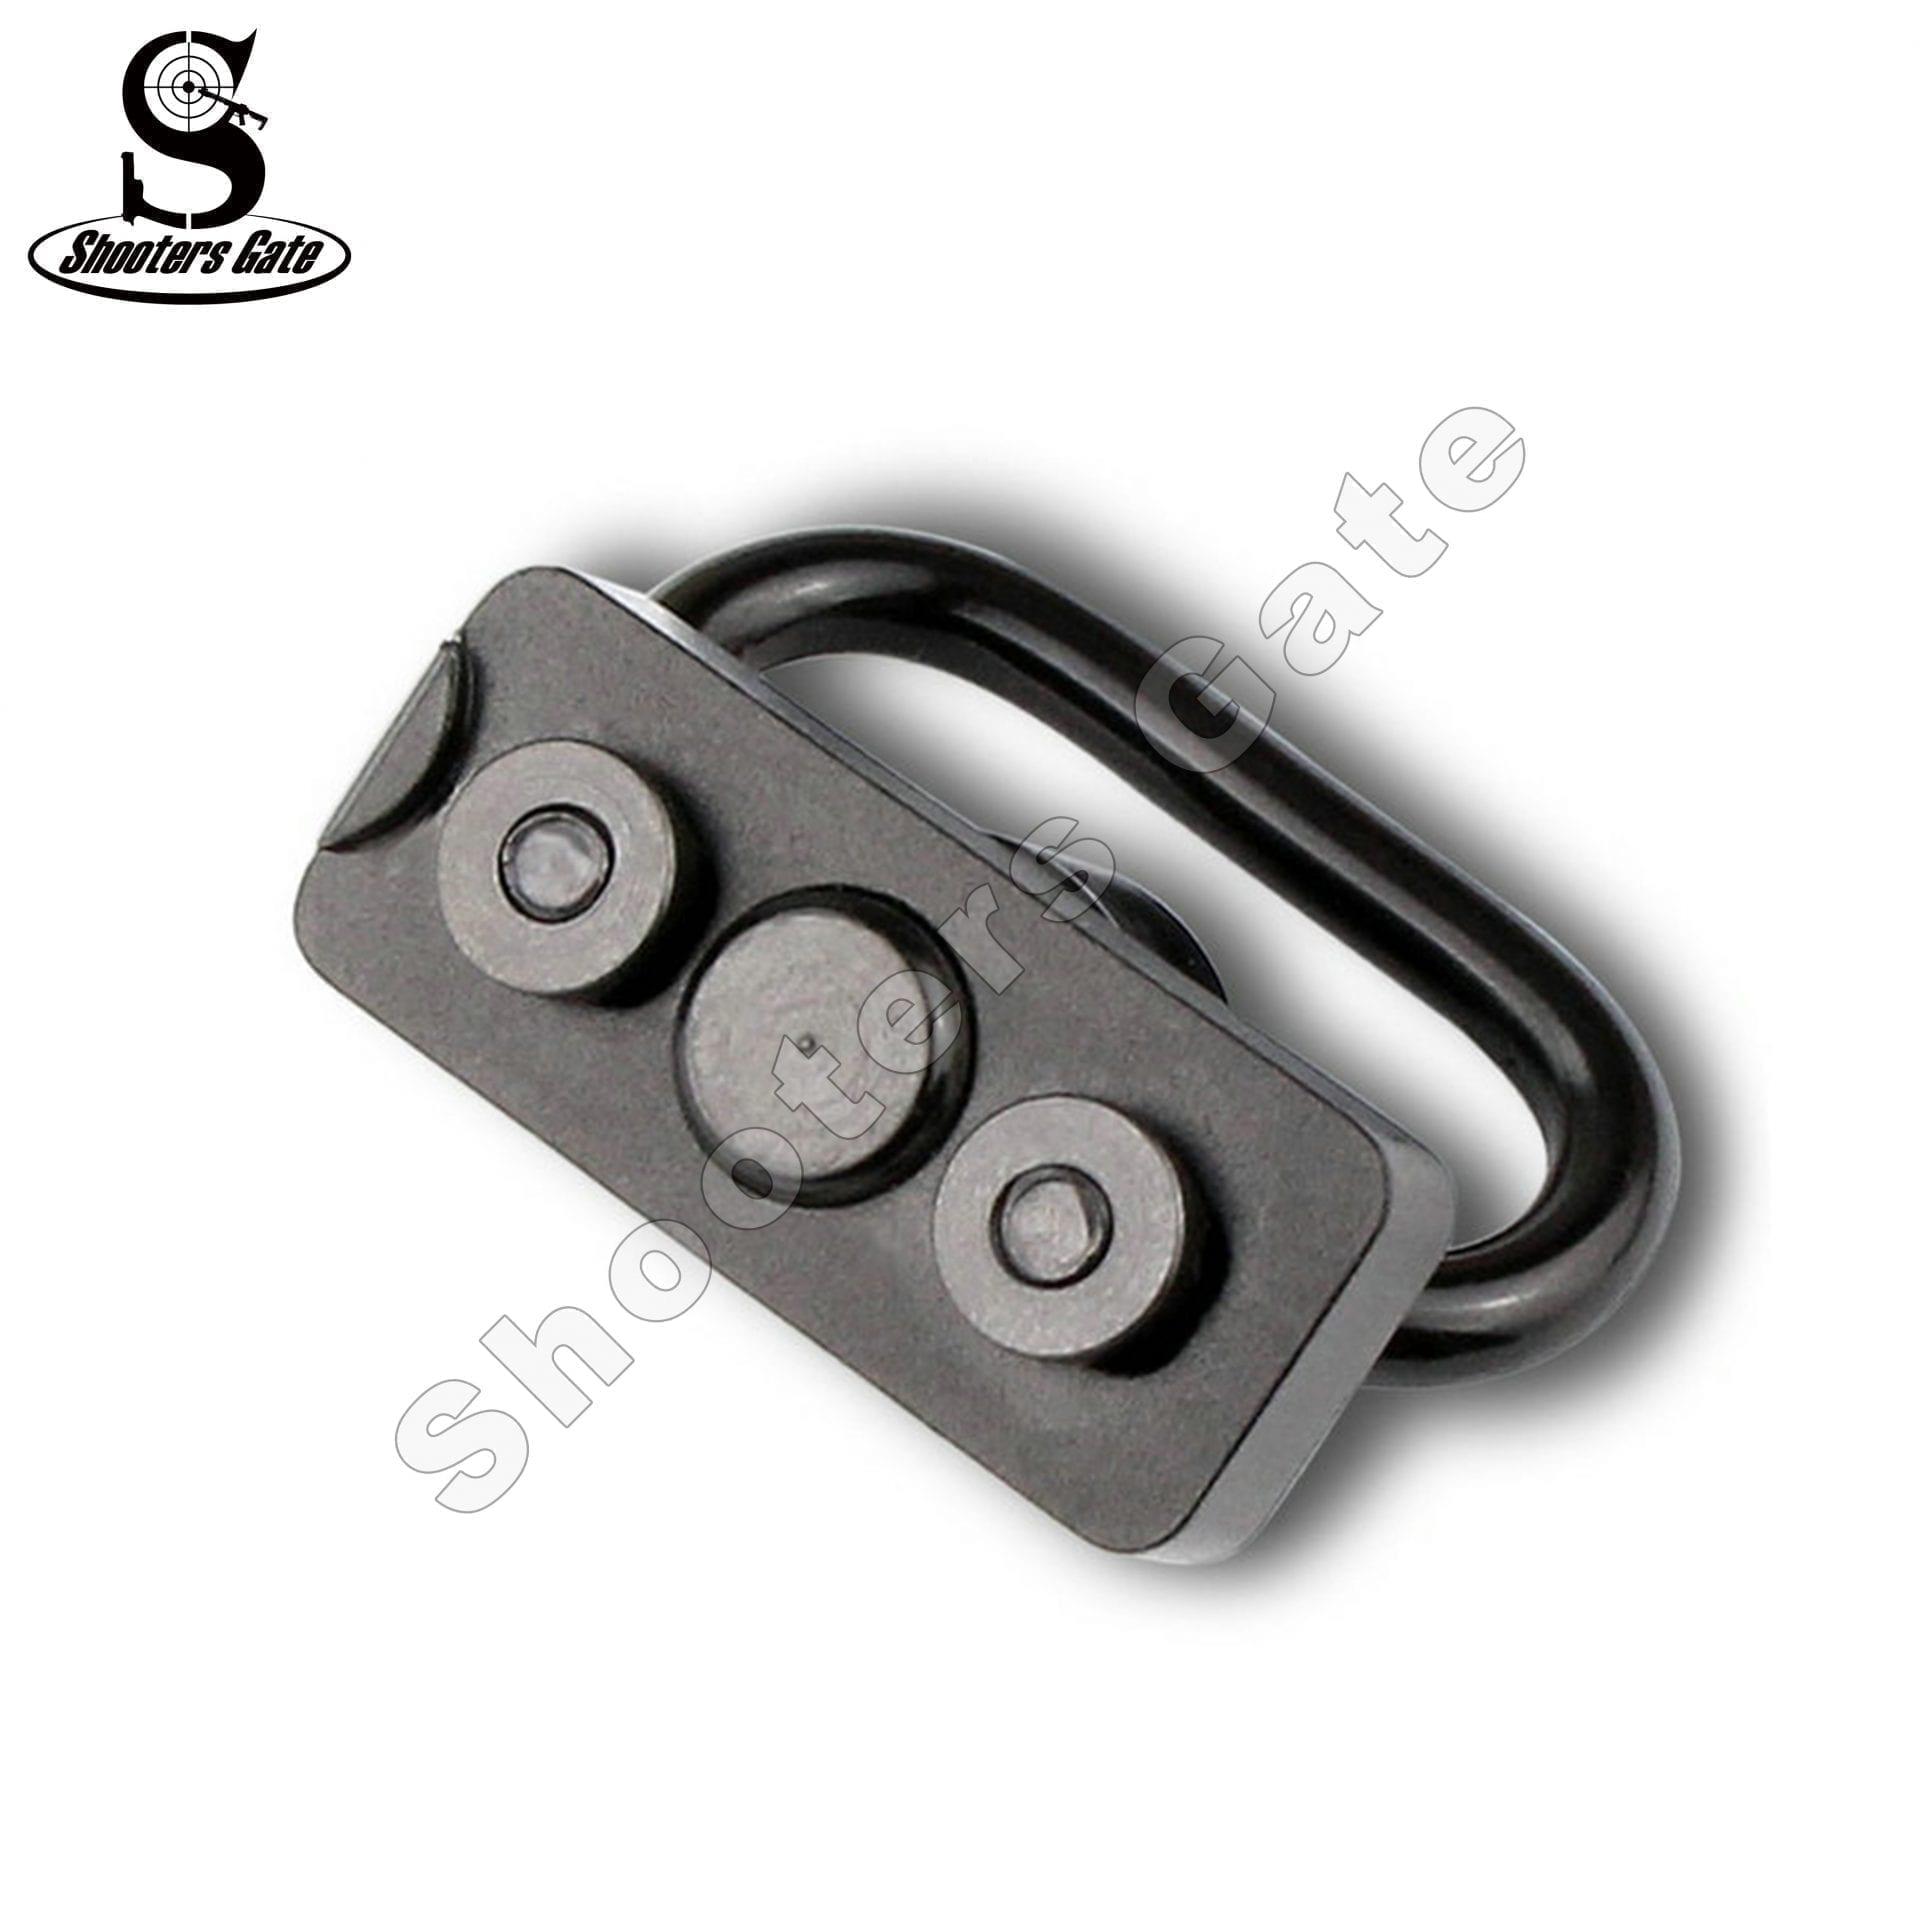 QD Sling Adapter KeyMod